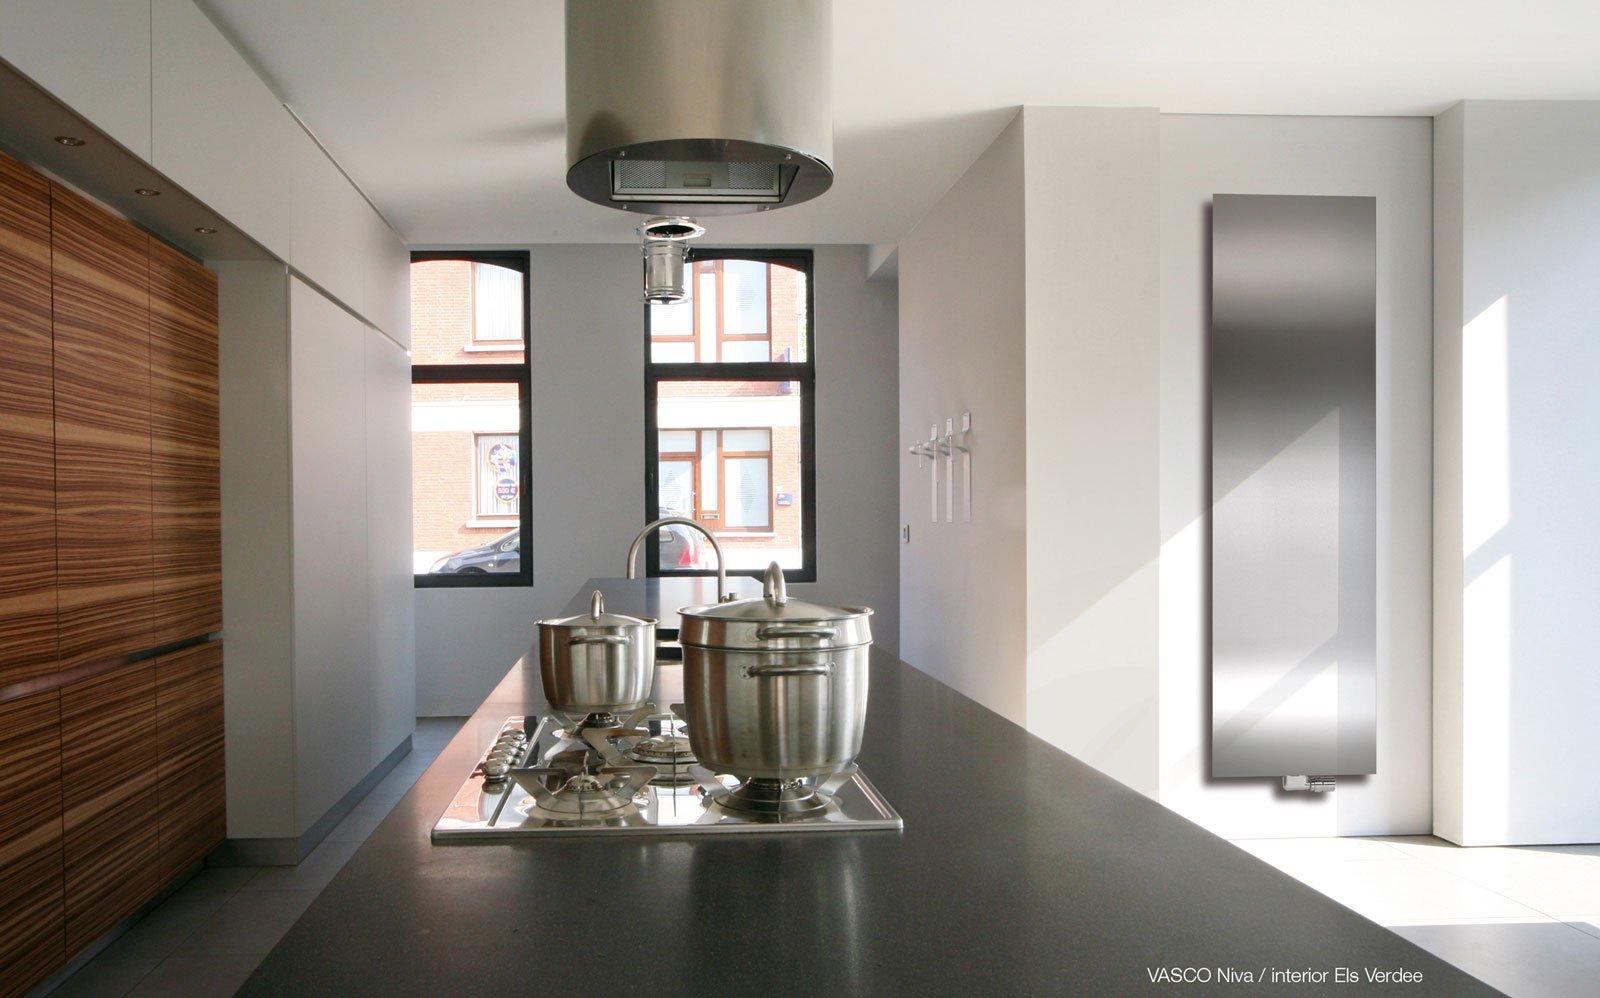 Verticale Designradiator Woonkamer : Designradiator woonkamer vasco u e wibma ontwerp